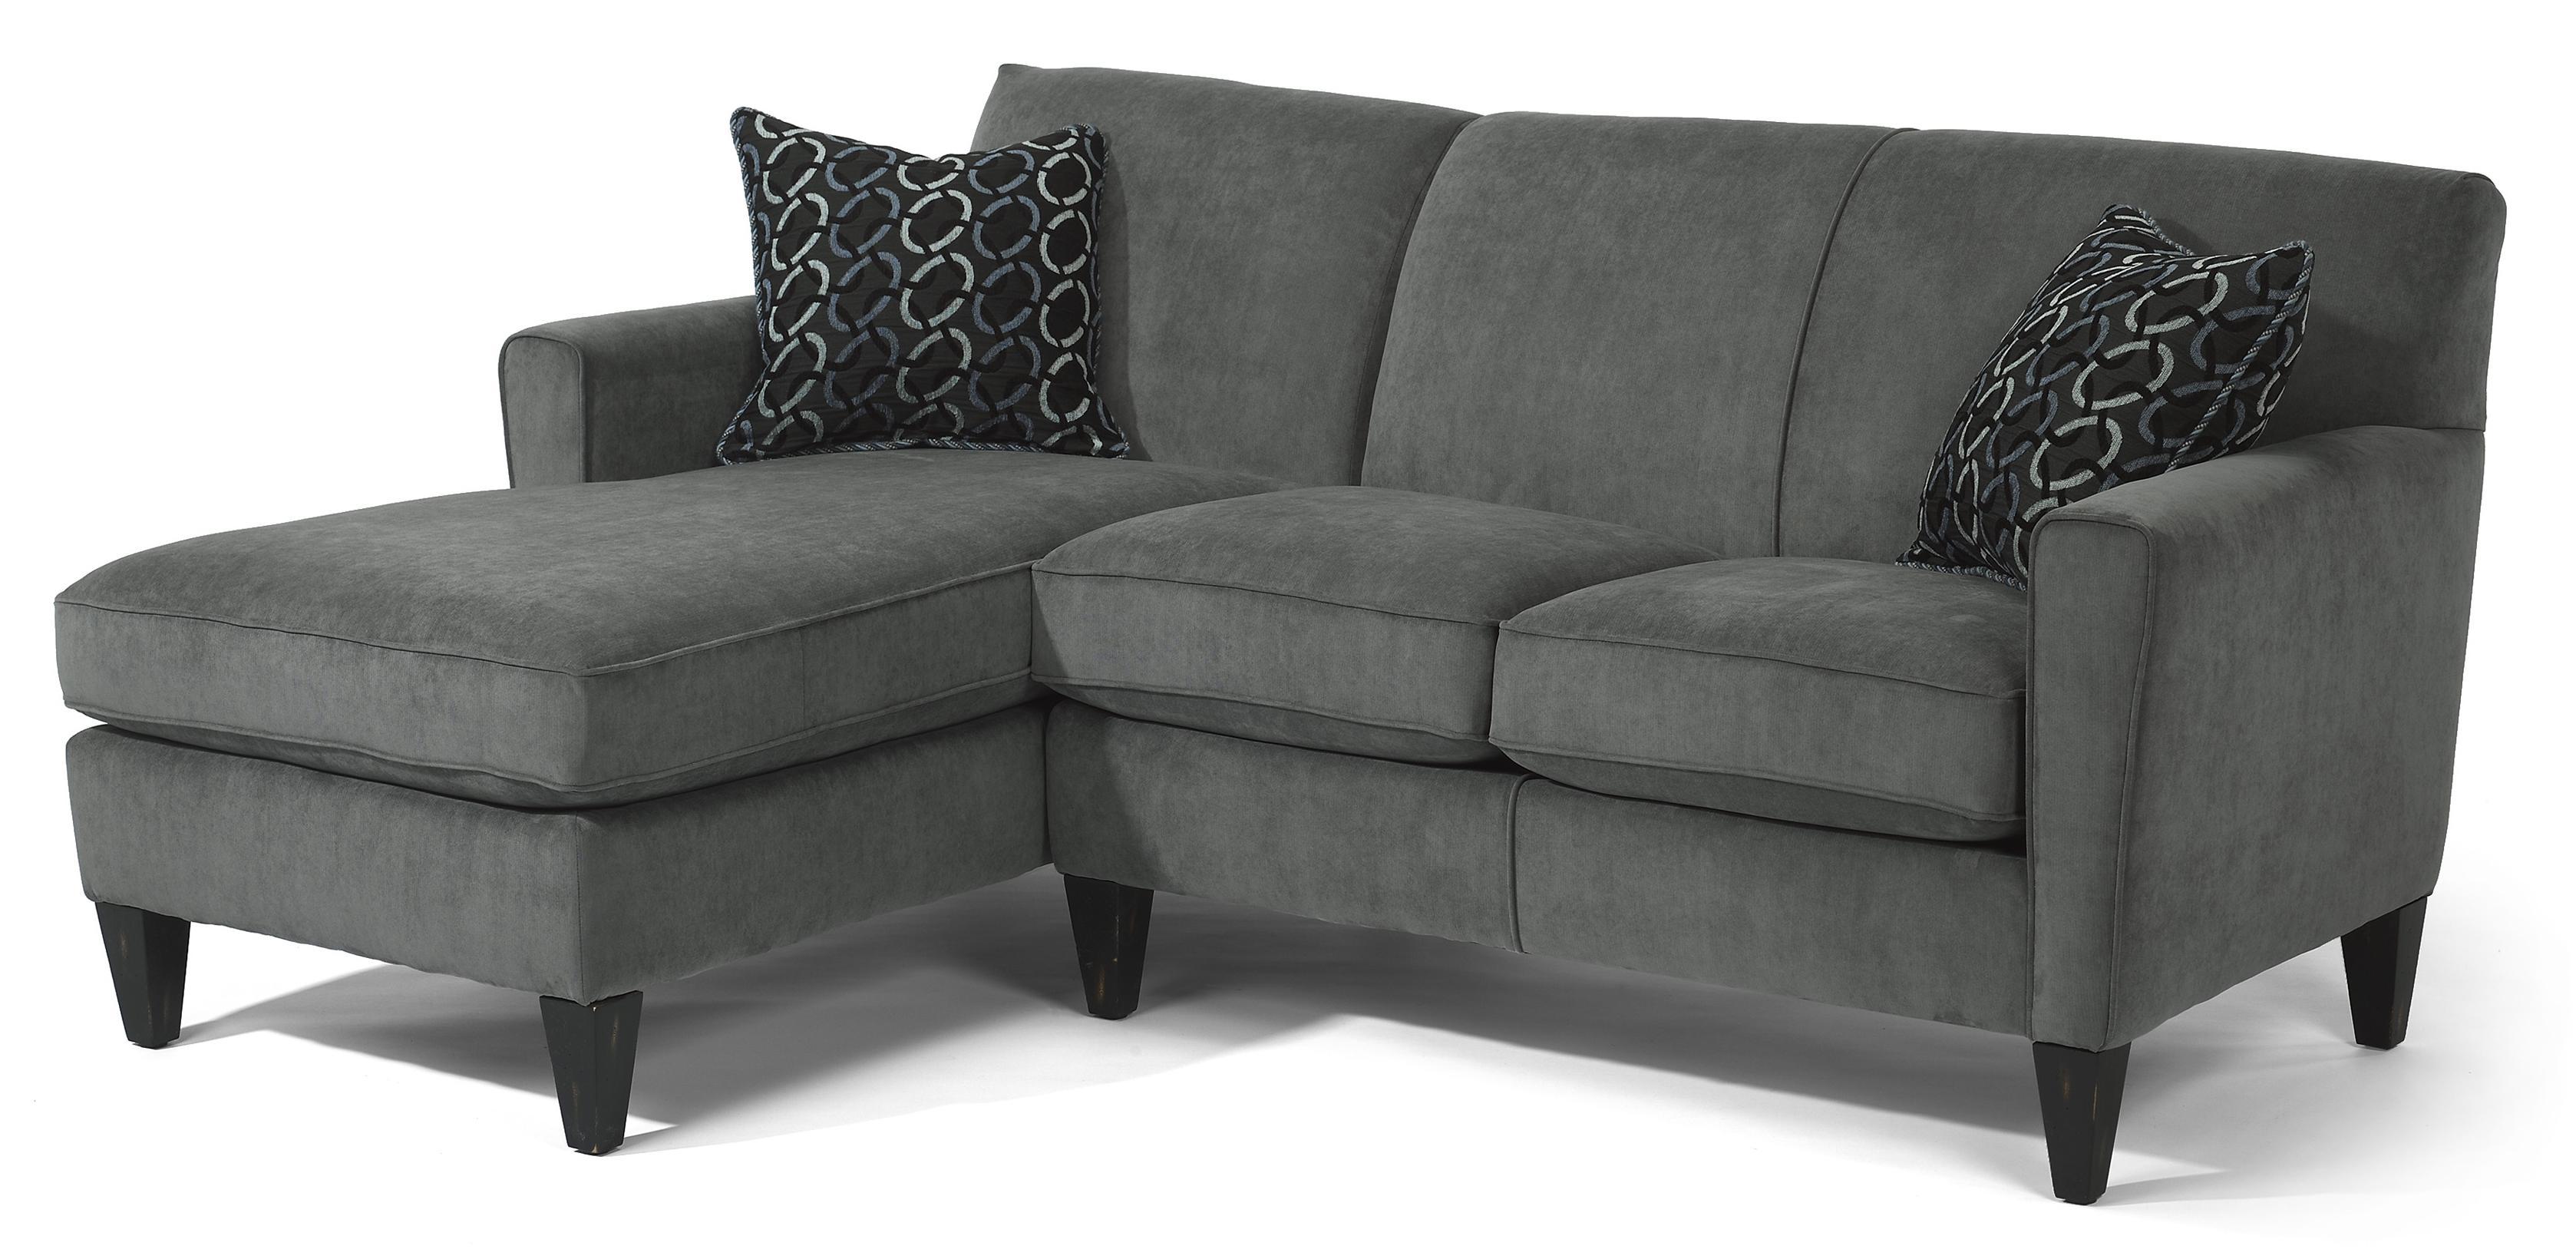 flexsteel thornton sectional sofa john lewis bailey reviews 5535 ...